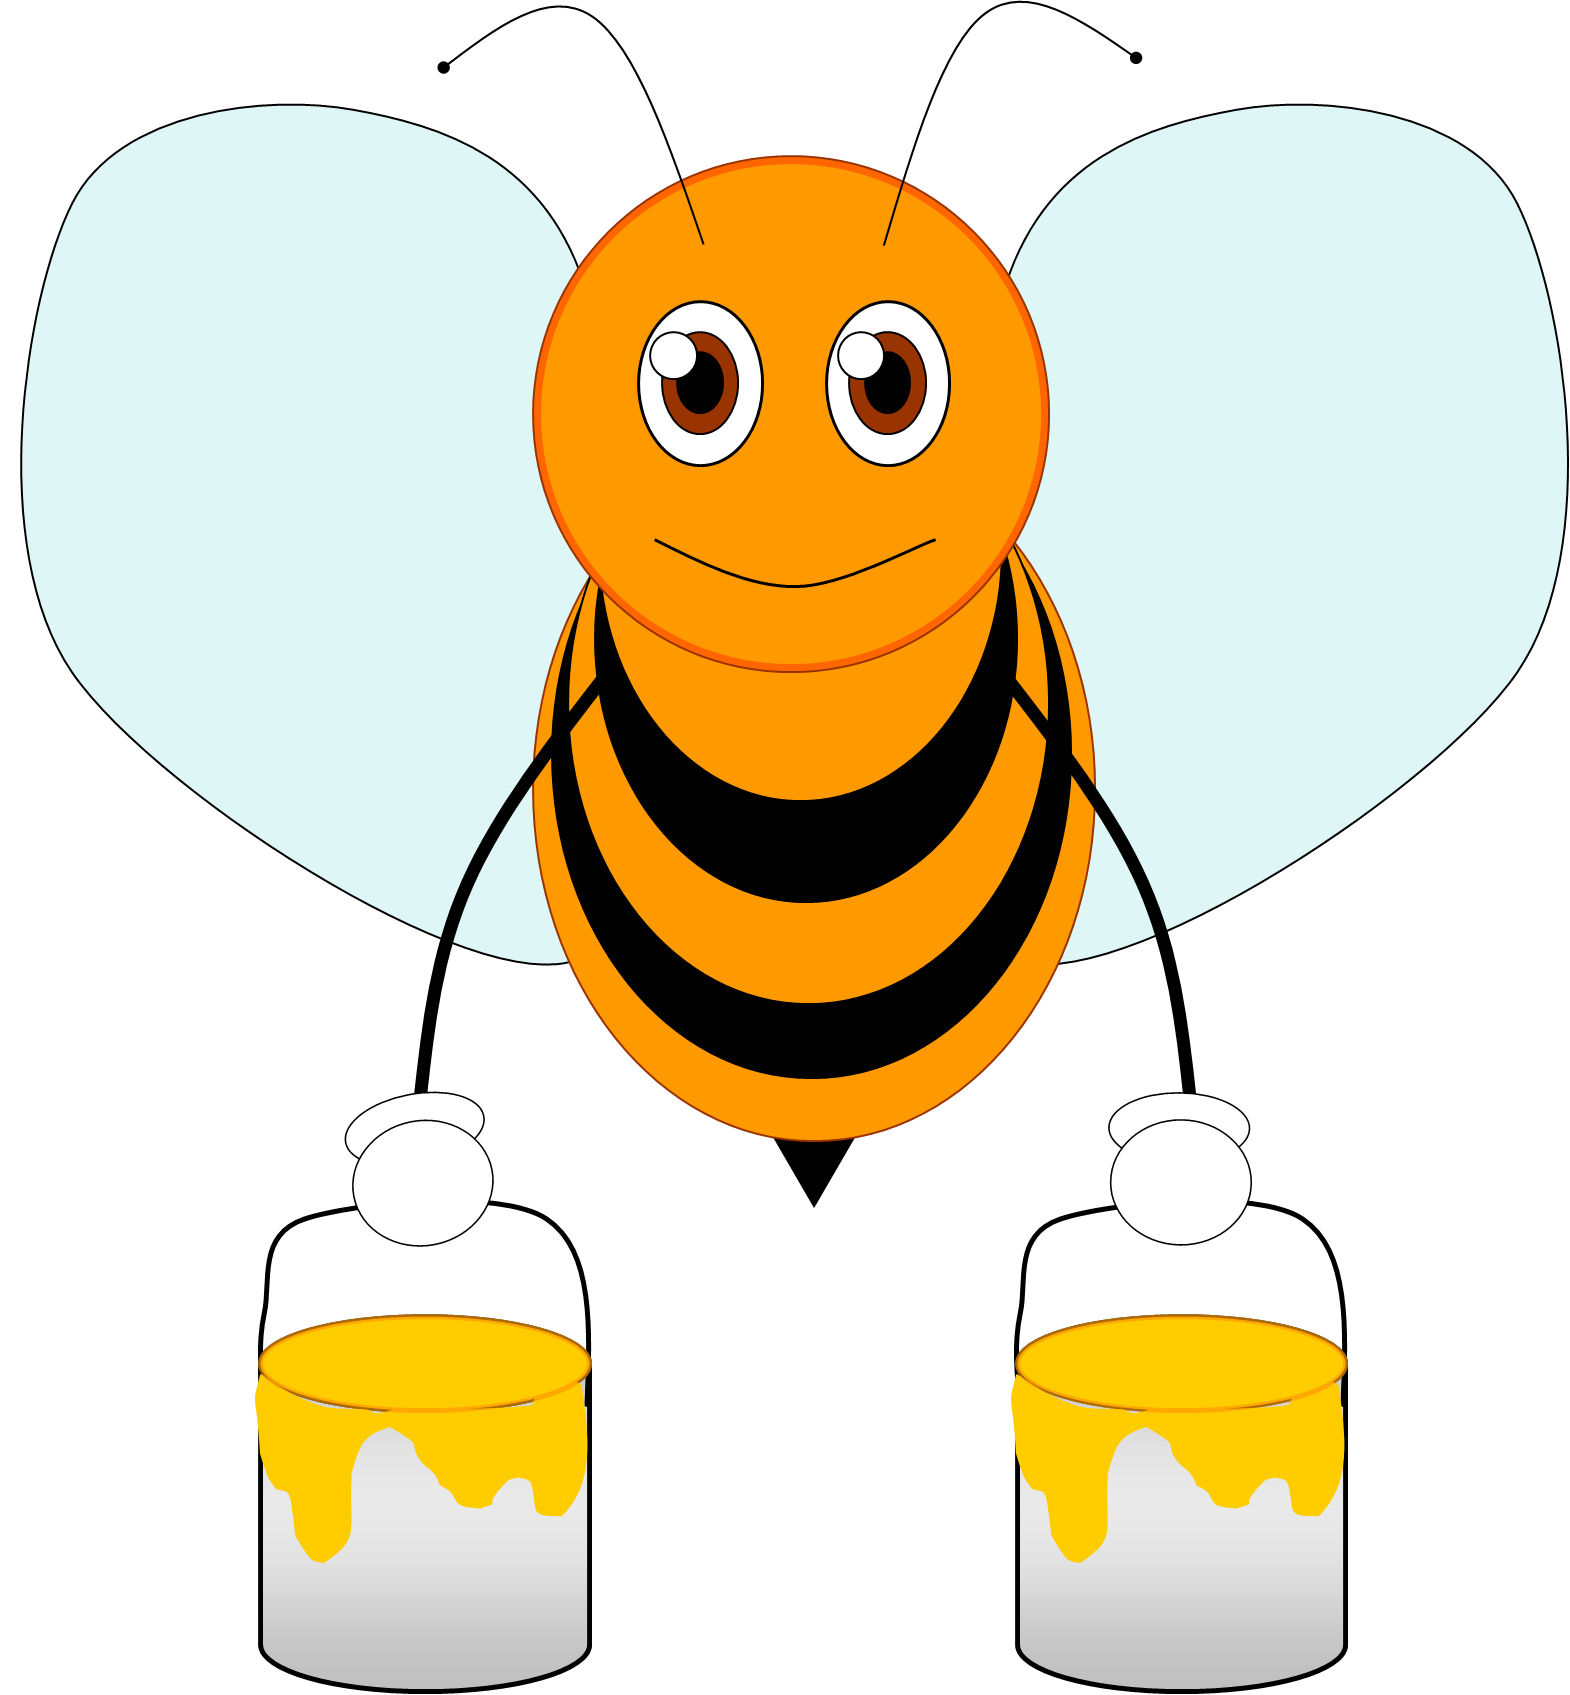 bee 2 free images at clker com vector clip art online royalty rh clker com